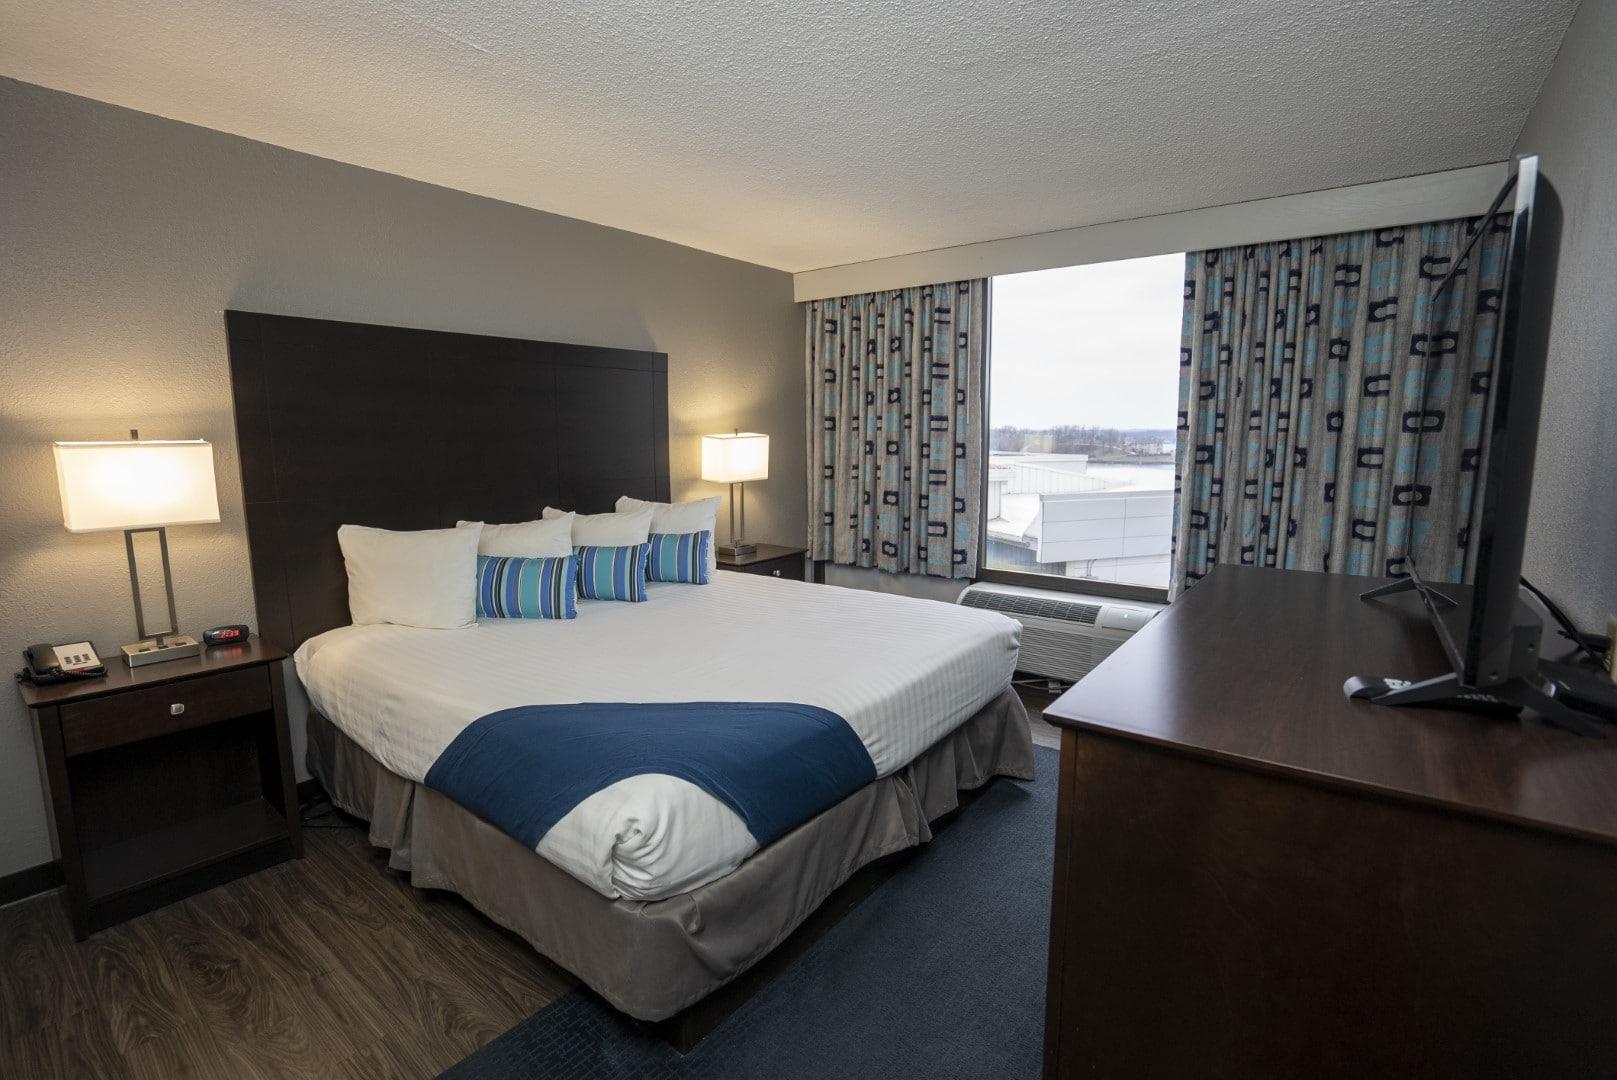 lakeozarkhotels thelodgeatportarrowhead kingroom